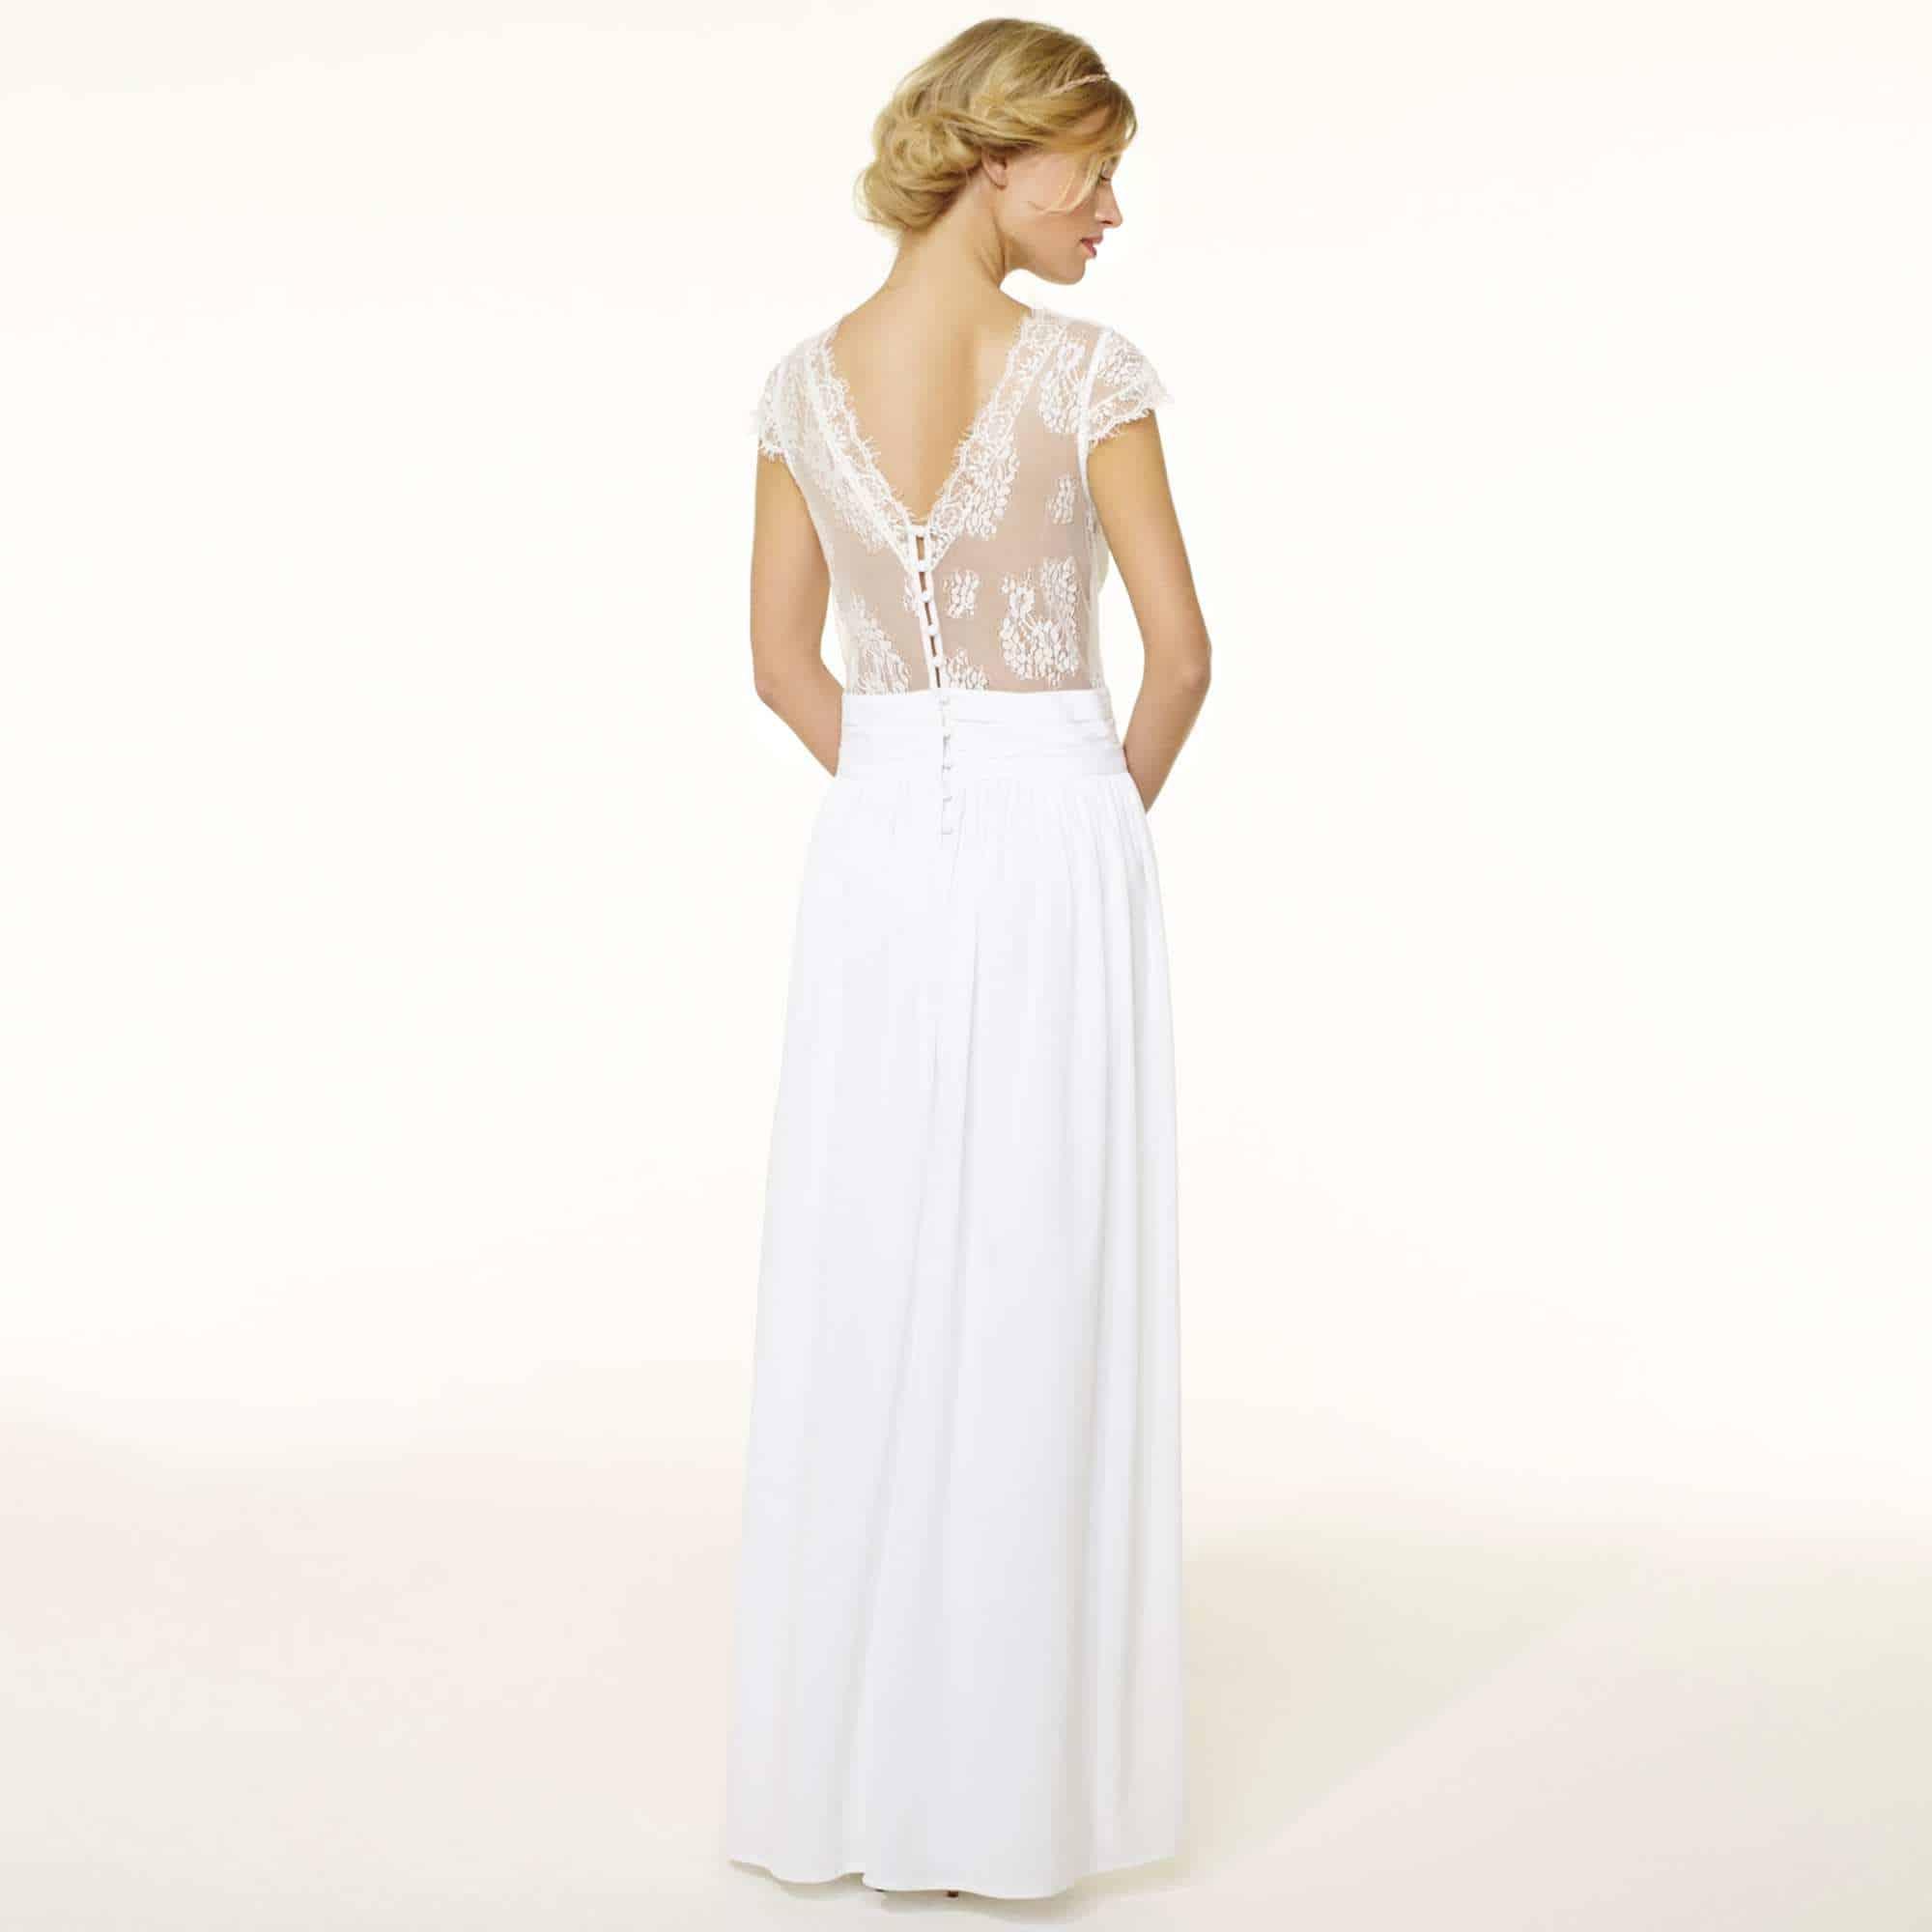 robe-de-mariee-avec-dentelle-blanc-femme-tw280_1_zc3